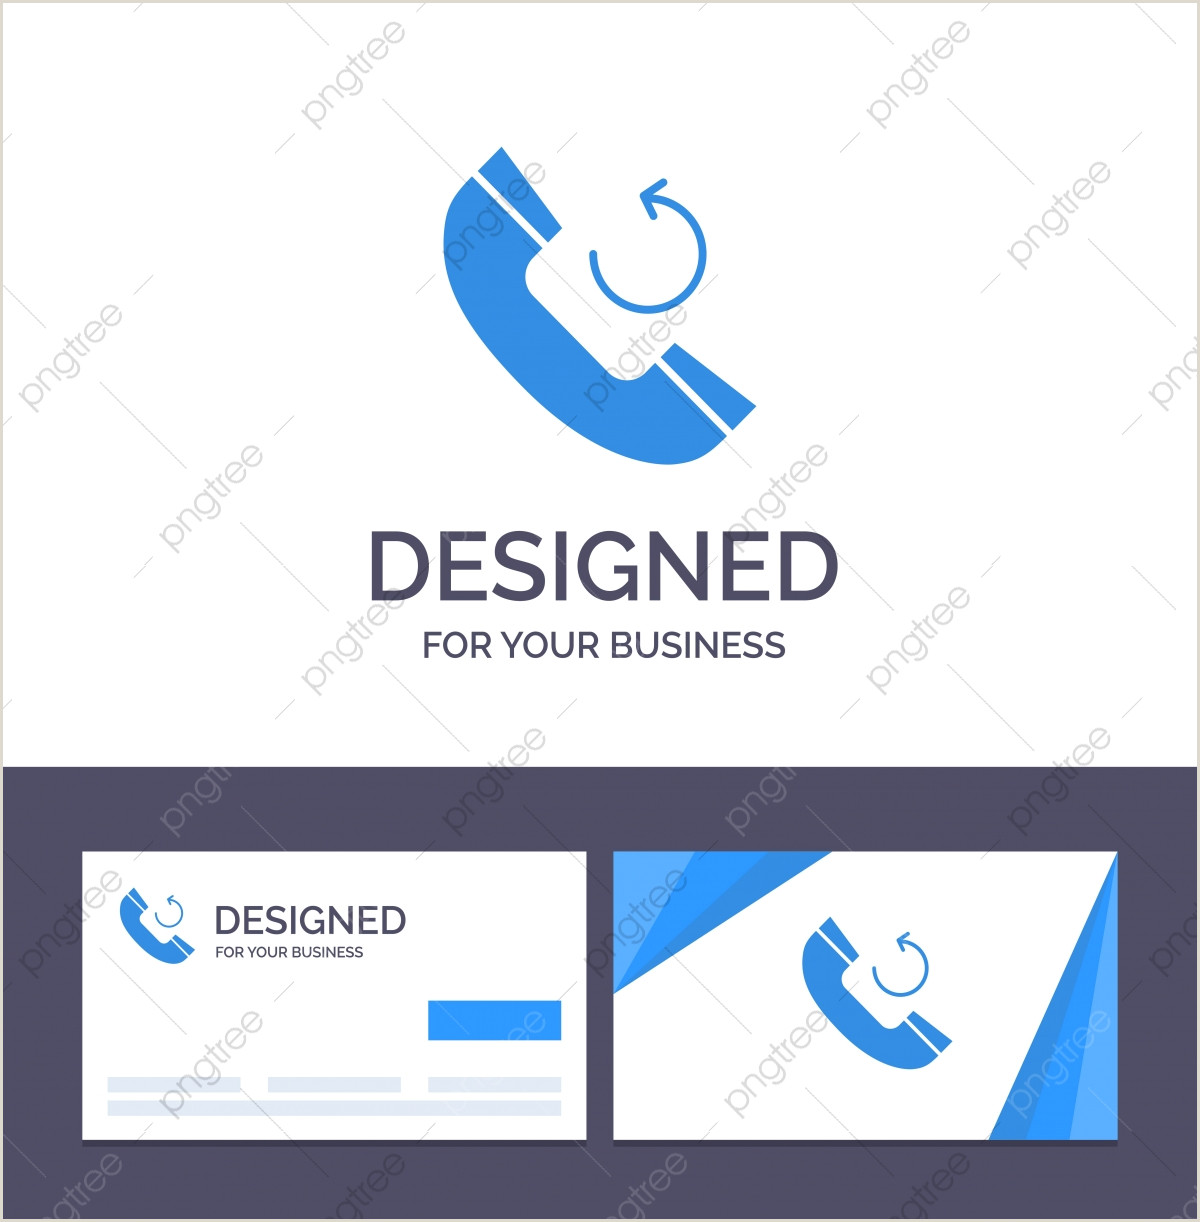 Corporate Calling Card Creative Business Card And Logo Template Call Phone Callback